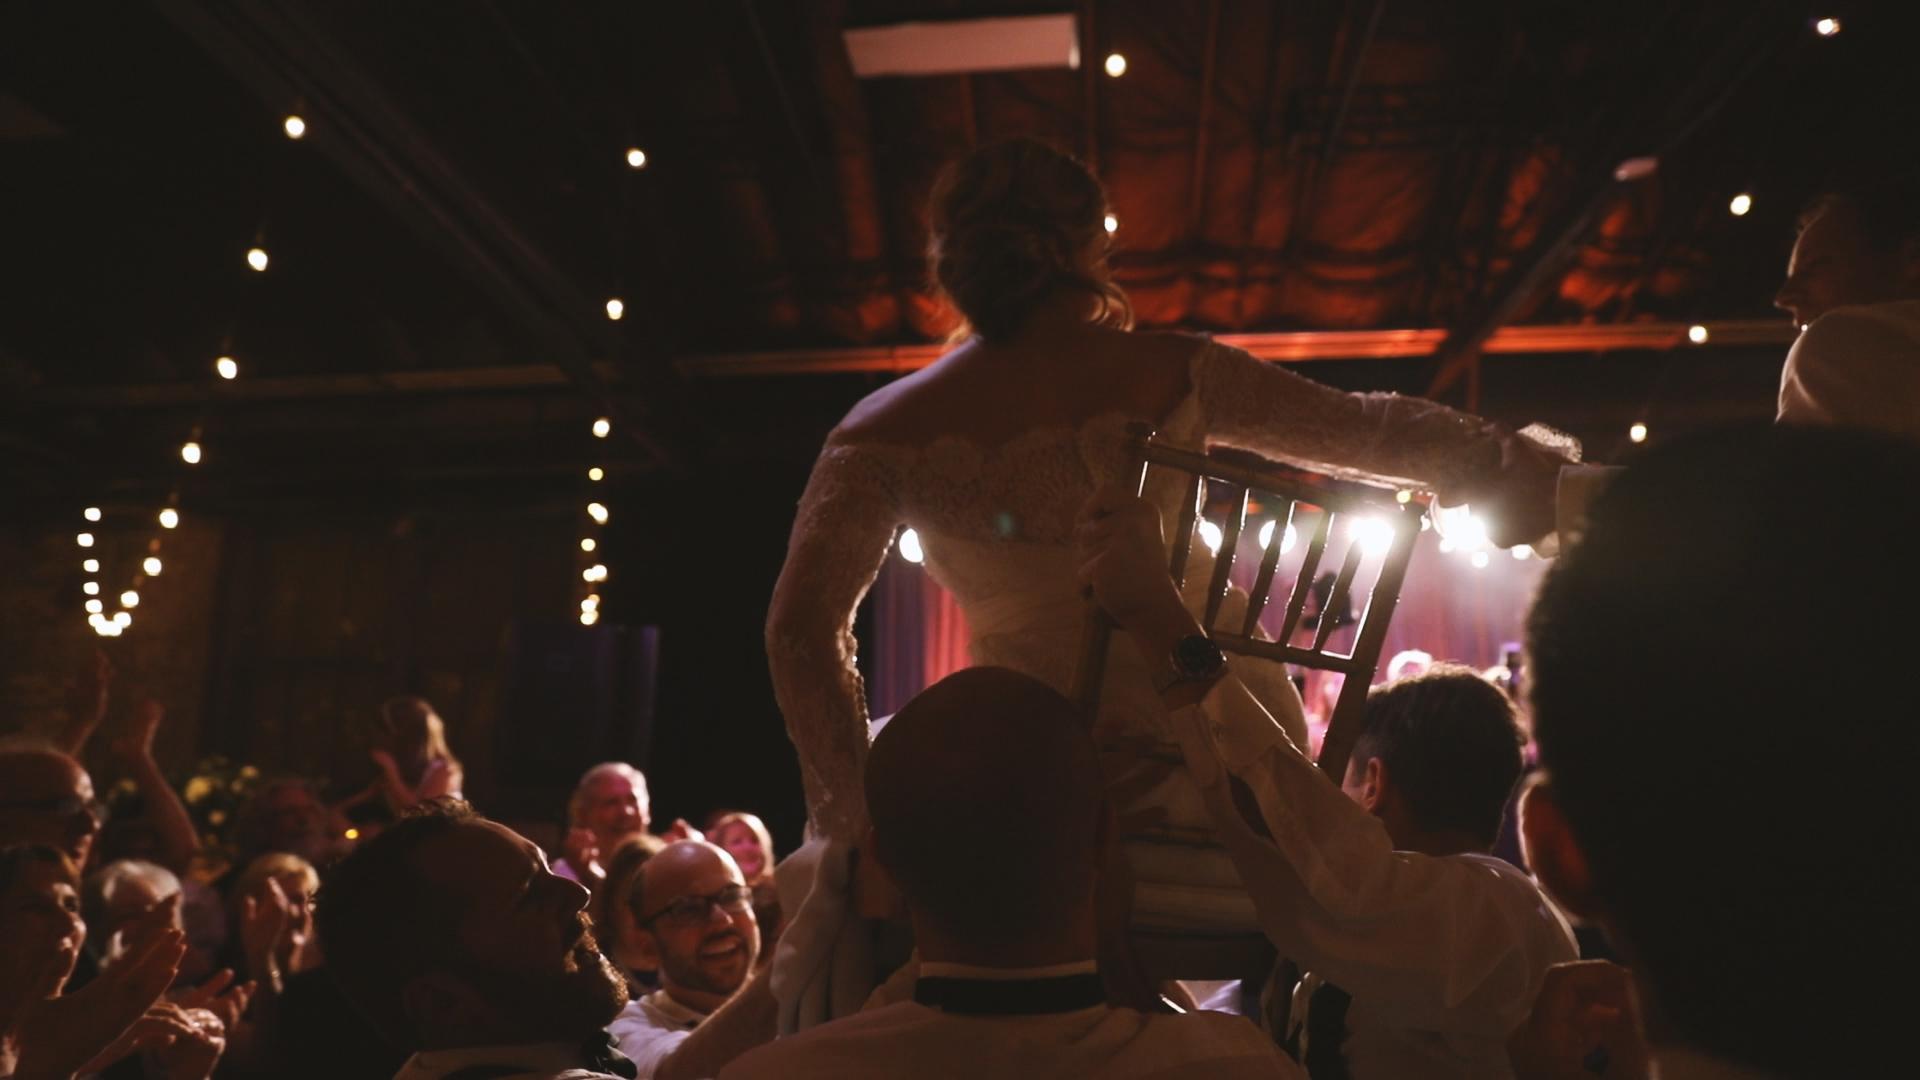 Colleen and Charles_Urban Contemporary Arts Center Wedding_New Orleans videographer_wedding hava nagila